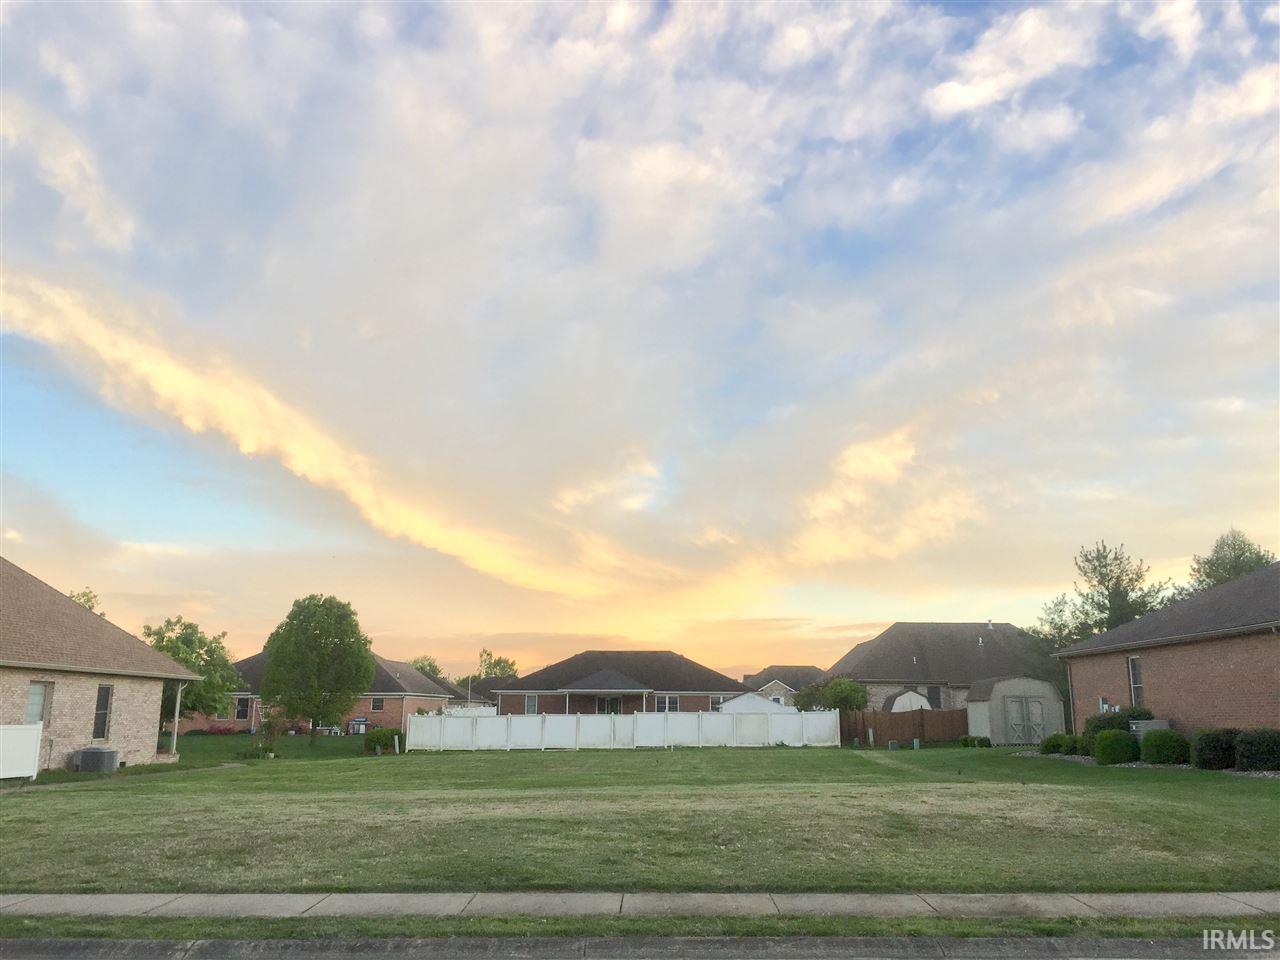 3701 Sandstone Ct, Evansville, IN 47711